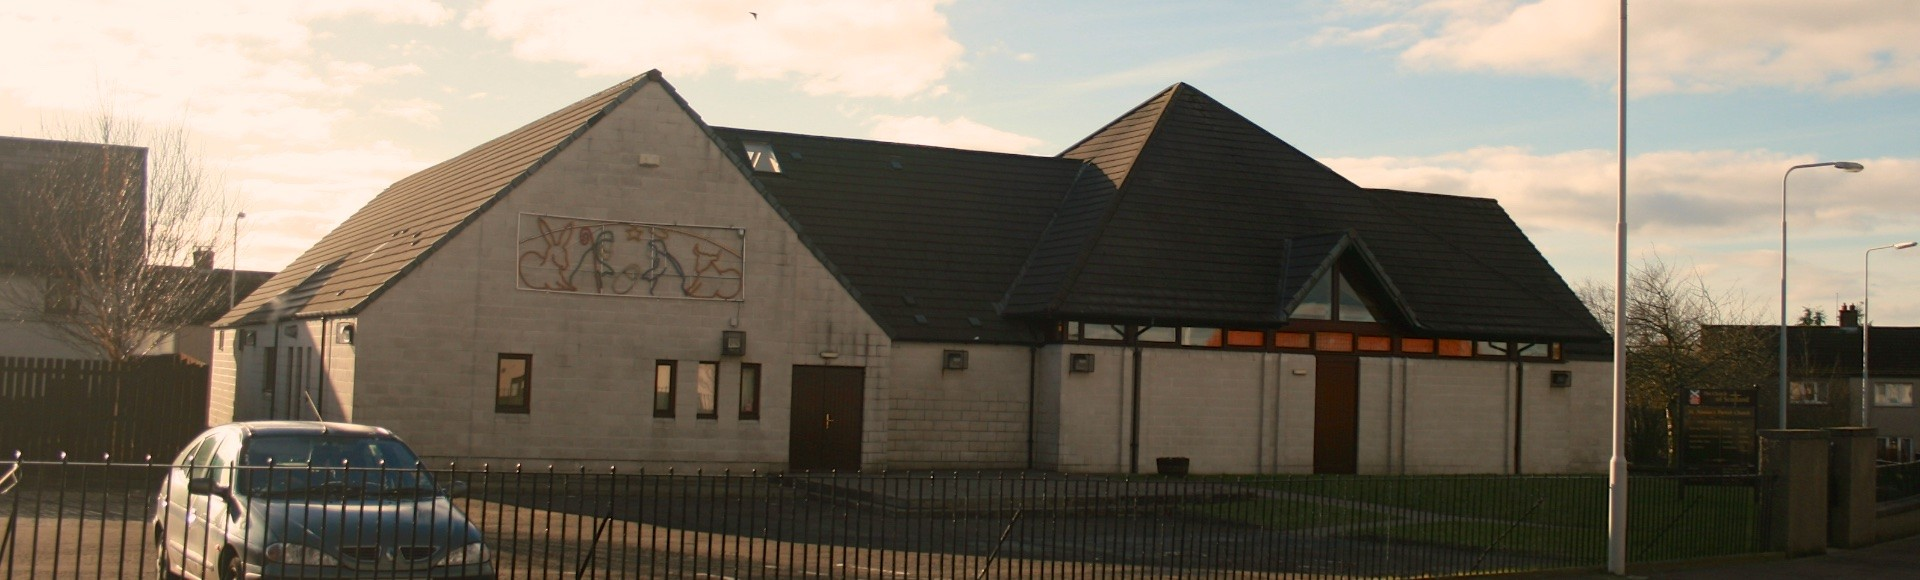 Dunfermline : St Ninian's